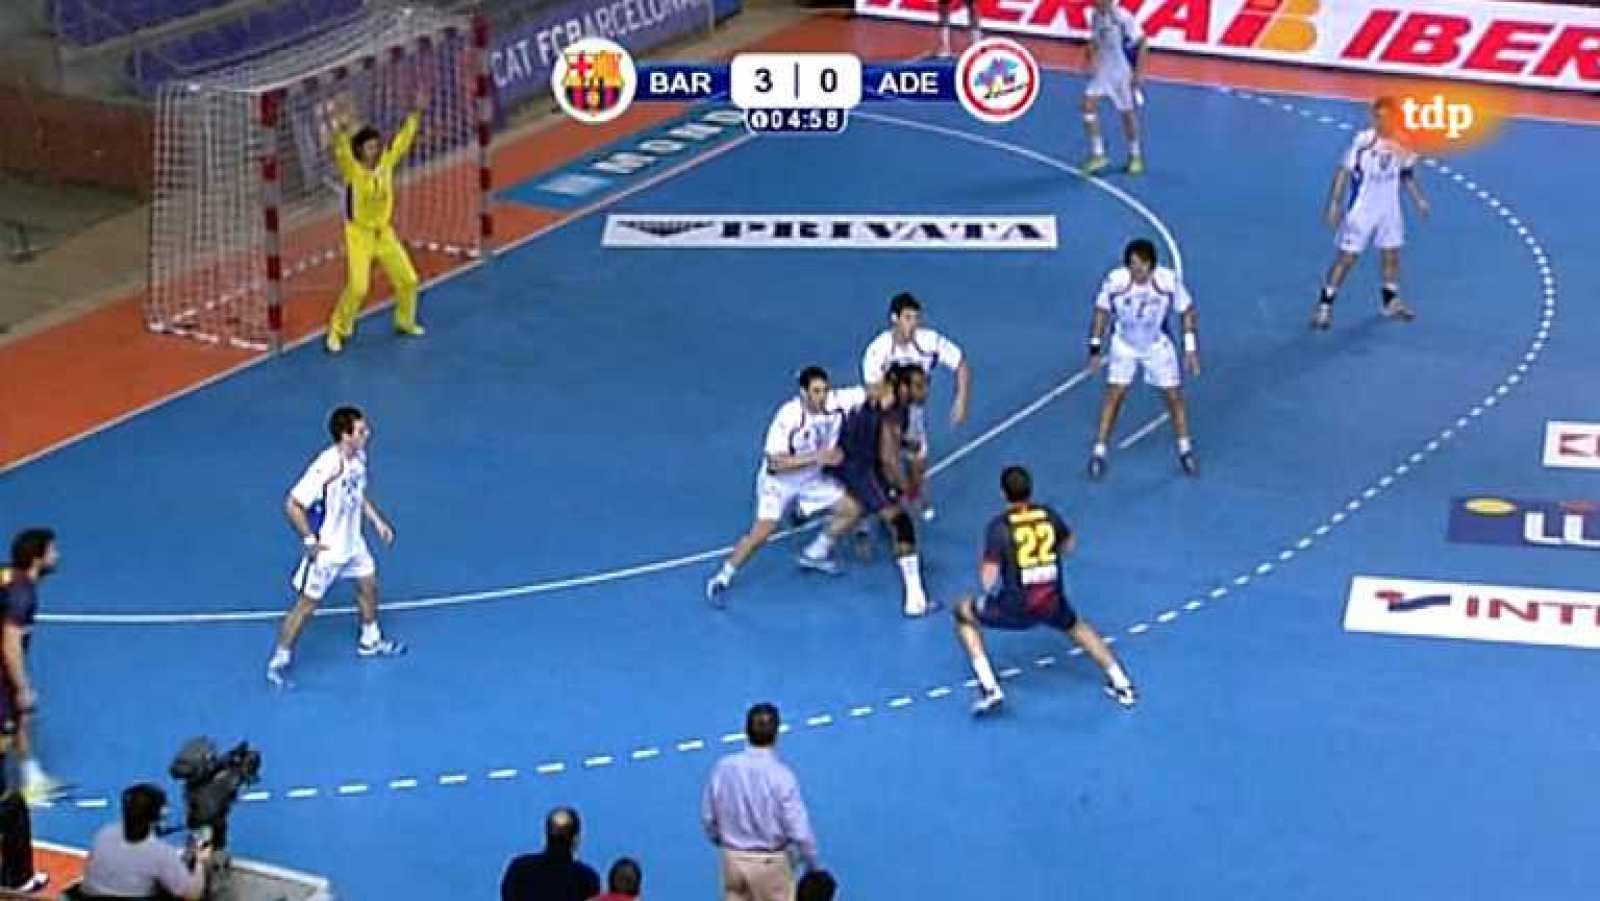 Balonmano - Liga de campeones. 7ª jornada: FC Barcelona Intersport - Kadetten Schaffhausen - Ver ahora